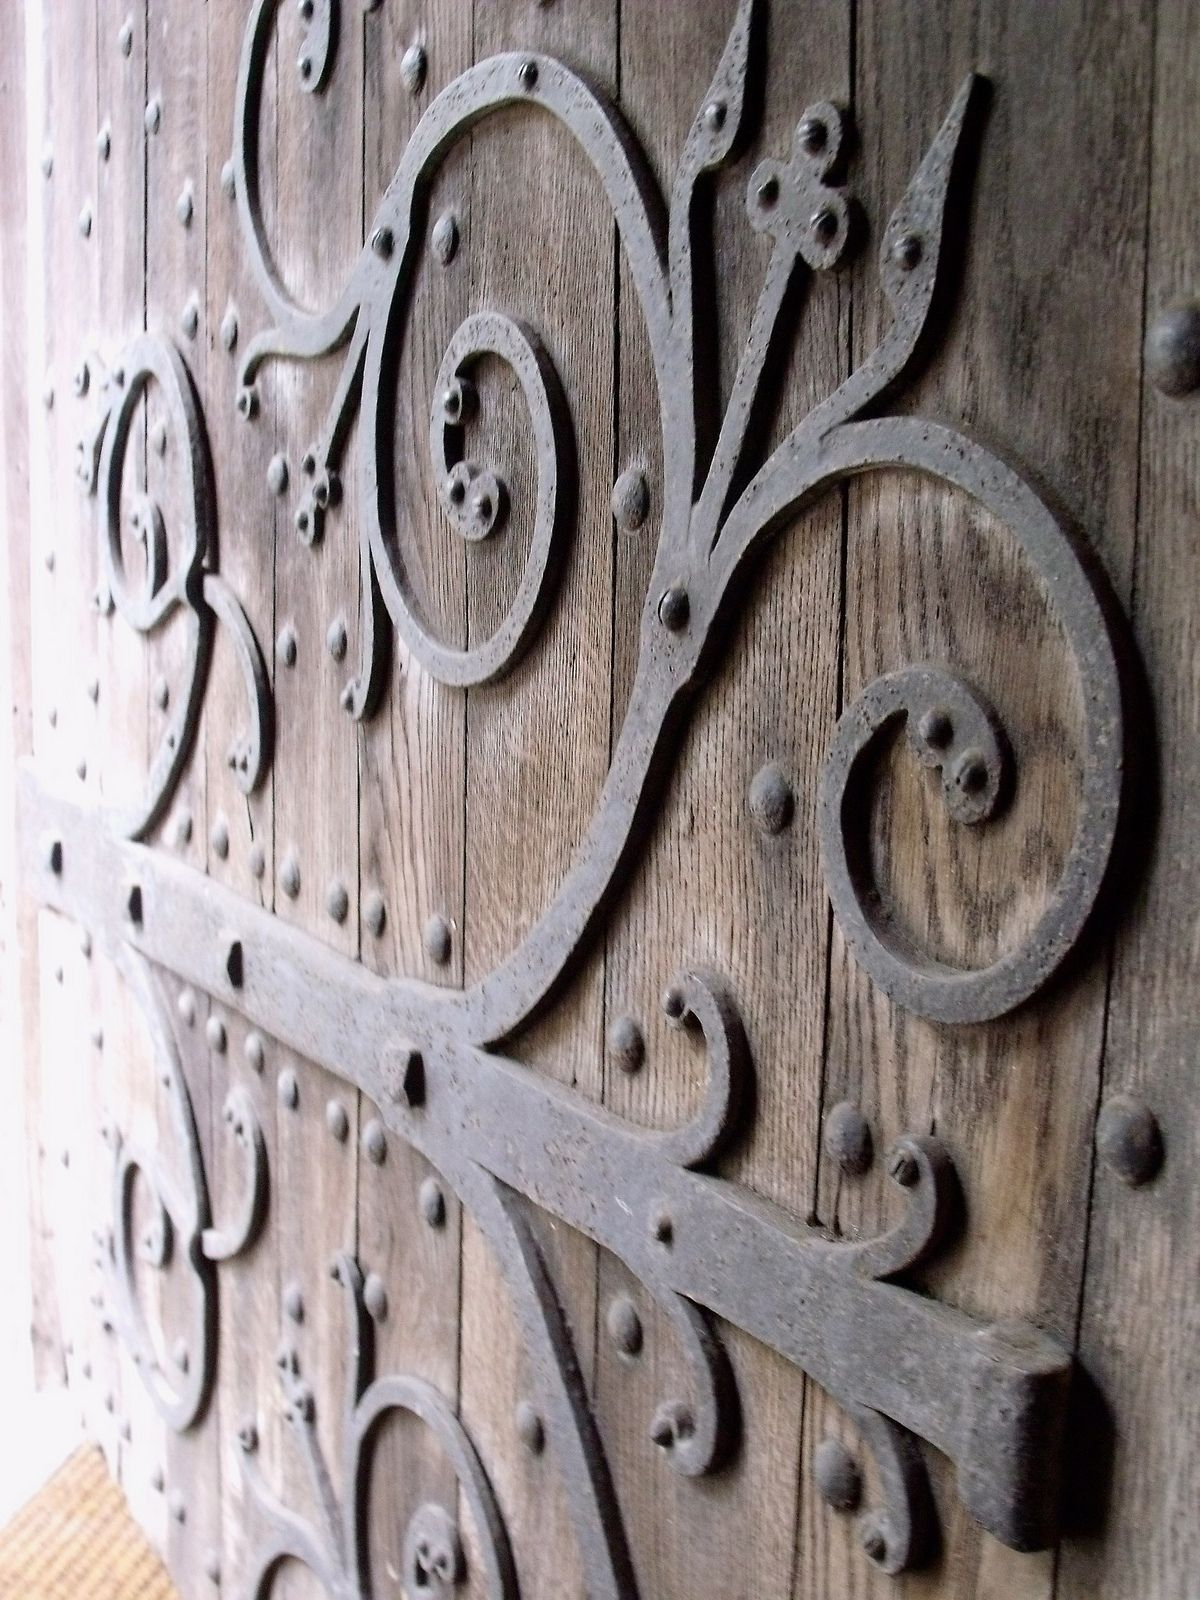 Old Doors Barn Doors French Country Kitchens Bradford On Avon Door Knockers Strap Hinges Wrought Iron Brave Medieval & Priory Barn door Bradford on Avon | Barn doors Barn and Doors